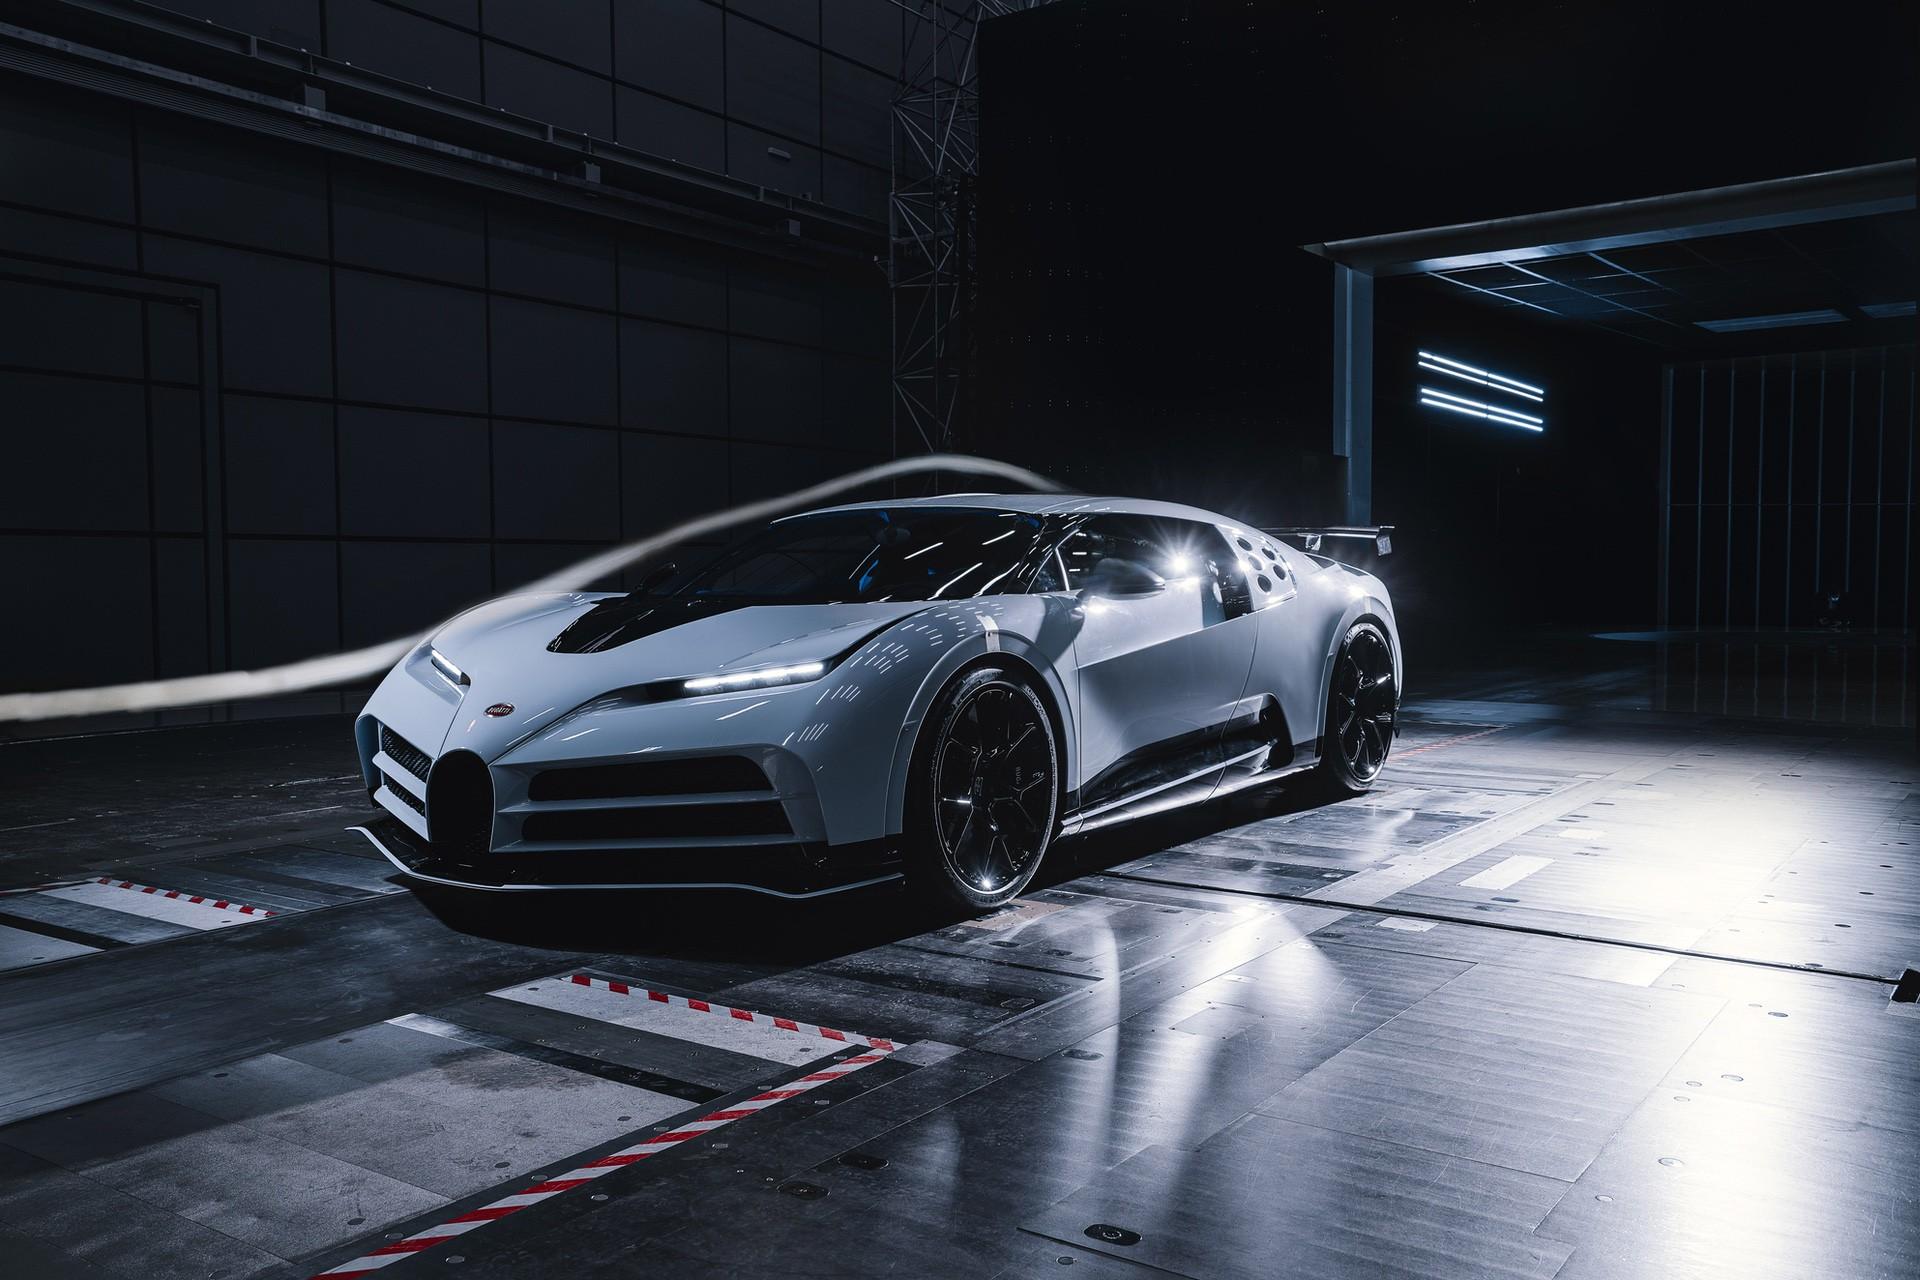 Bugatti_Centodieci_windtunnel_tests-0001